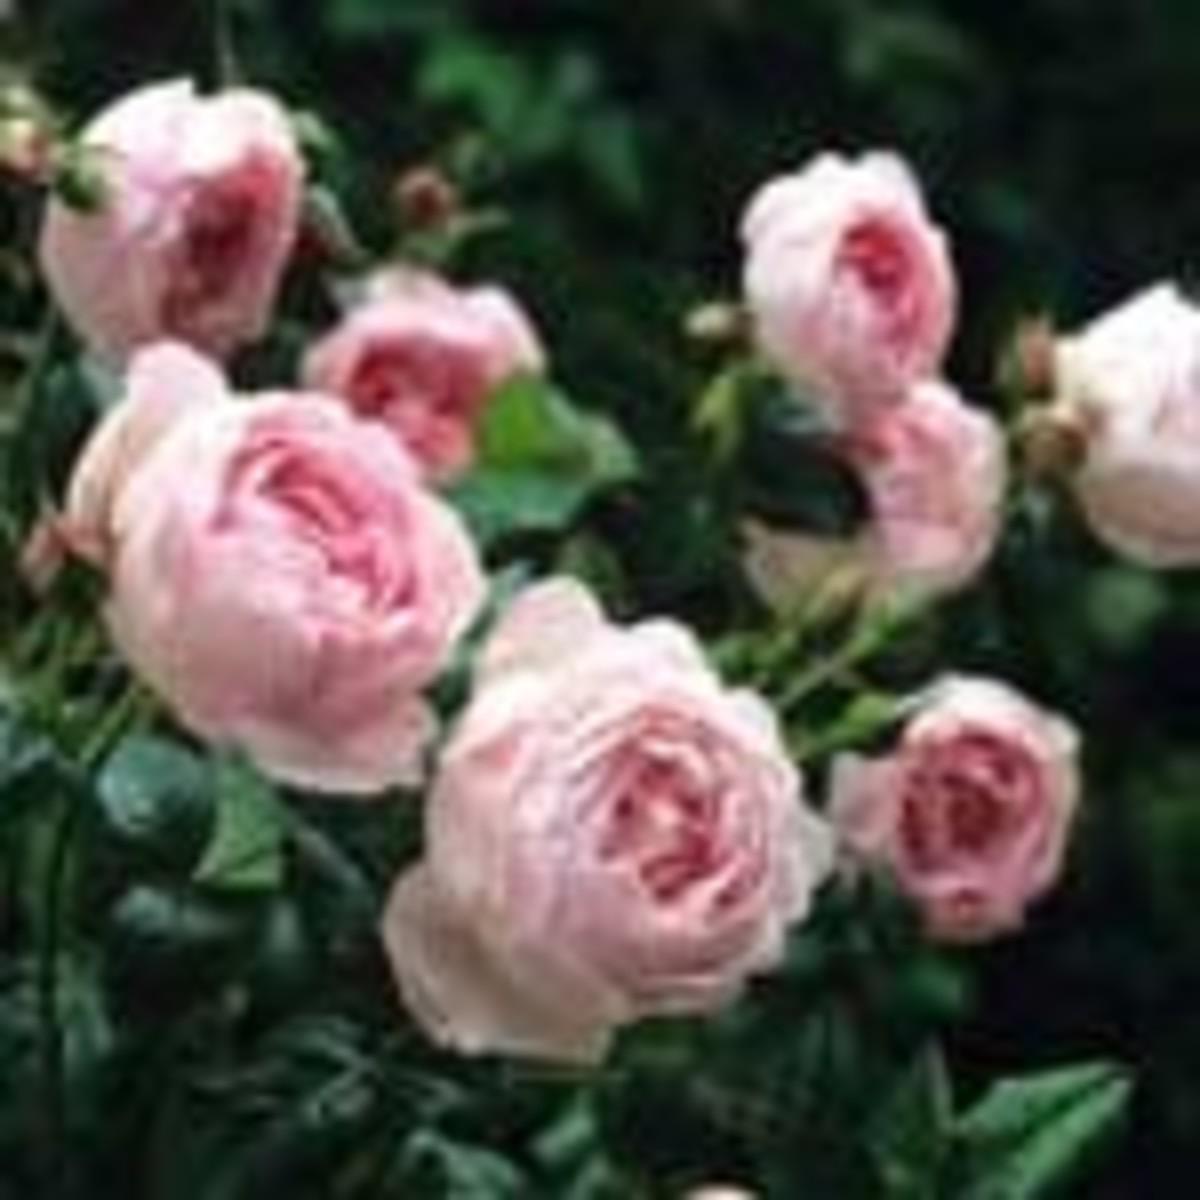 Scepter'd Isle rose